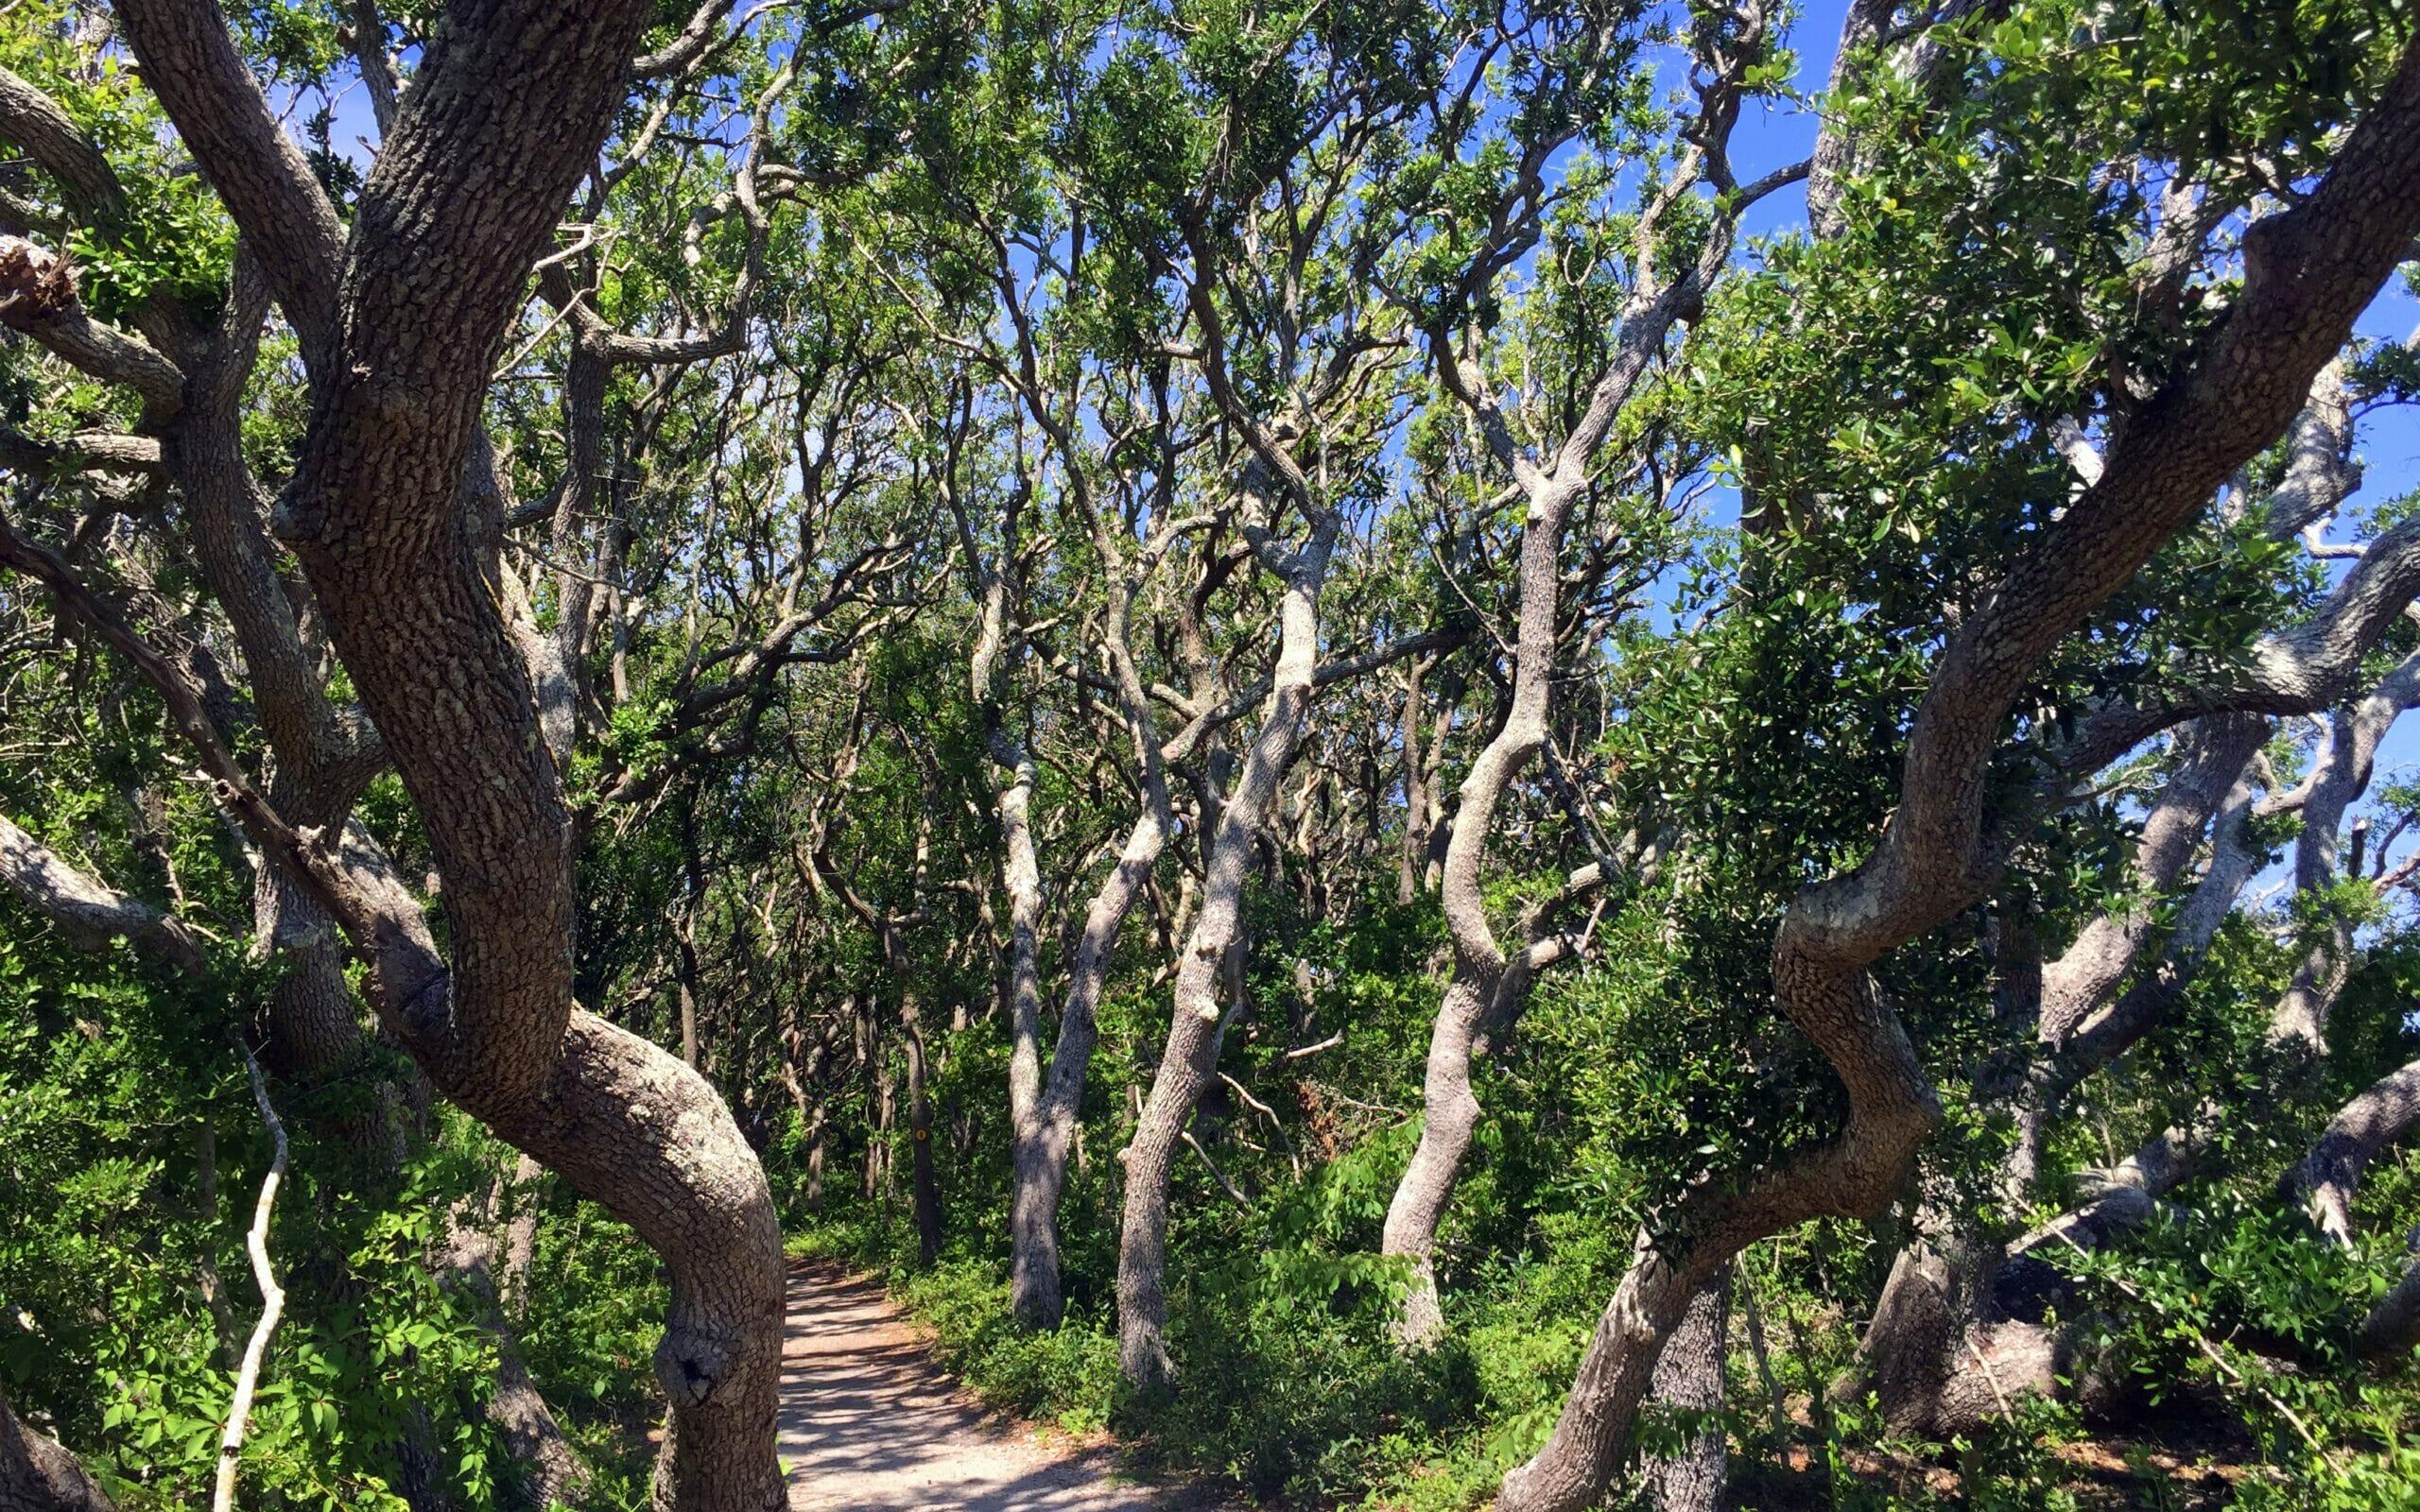 Pathway through twisty trees